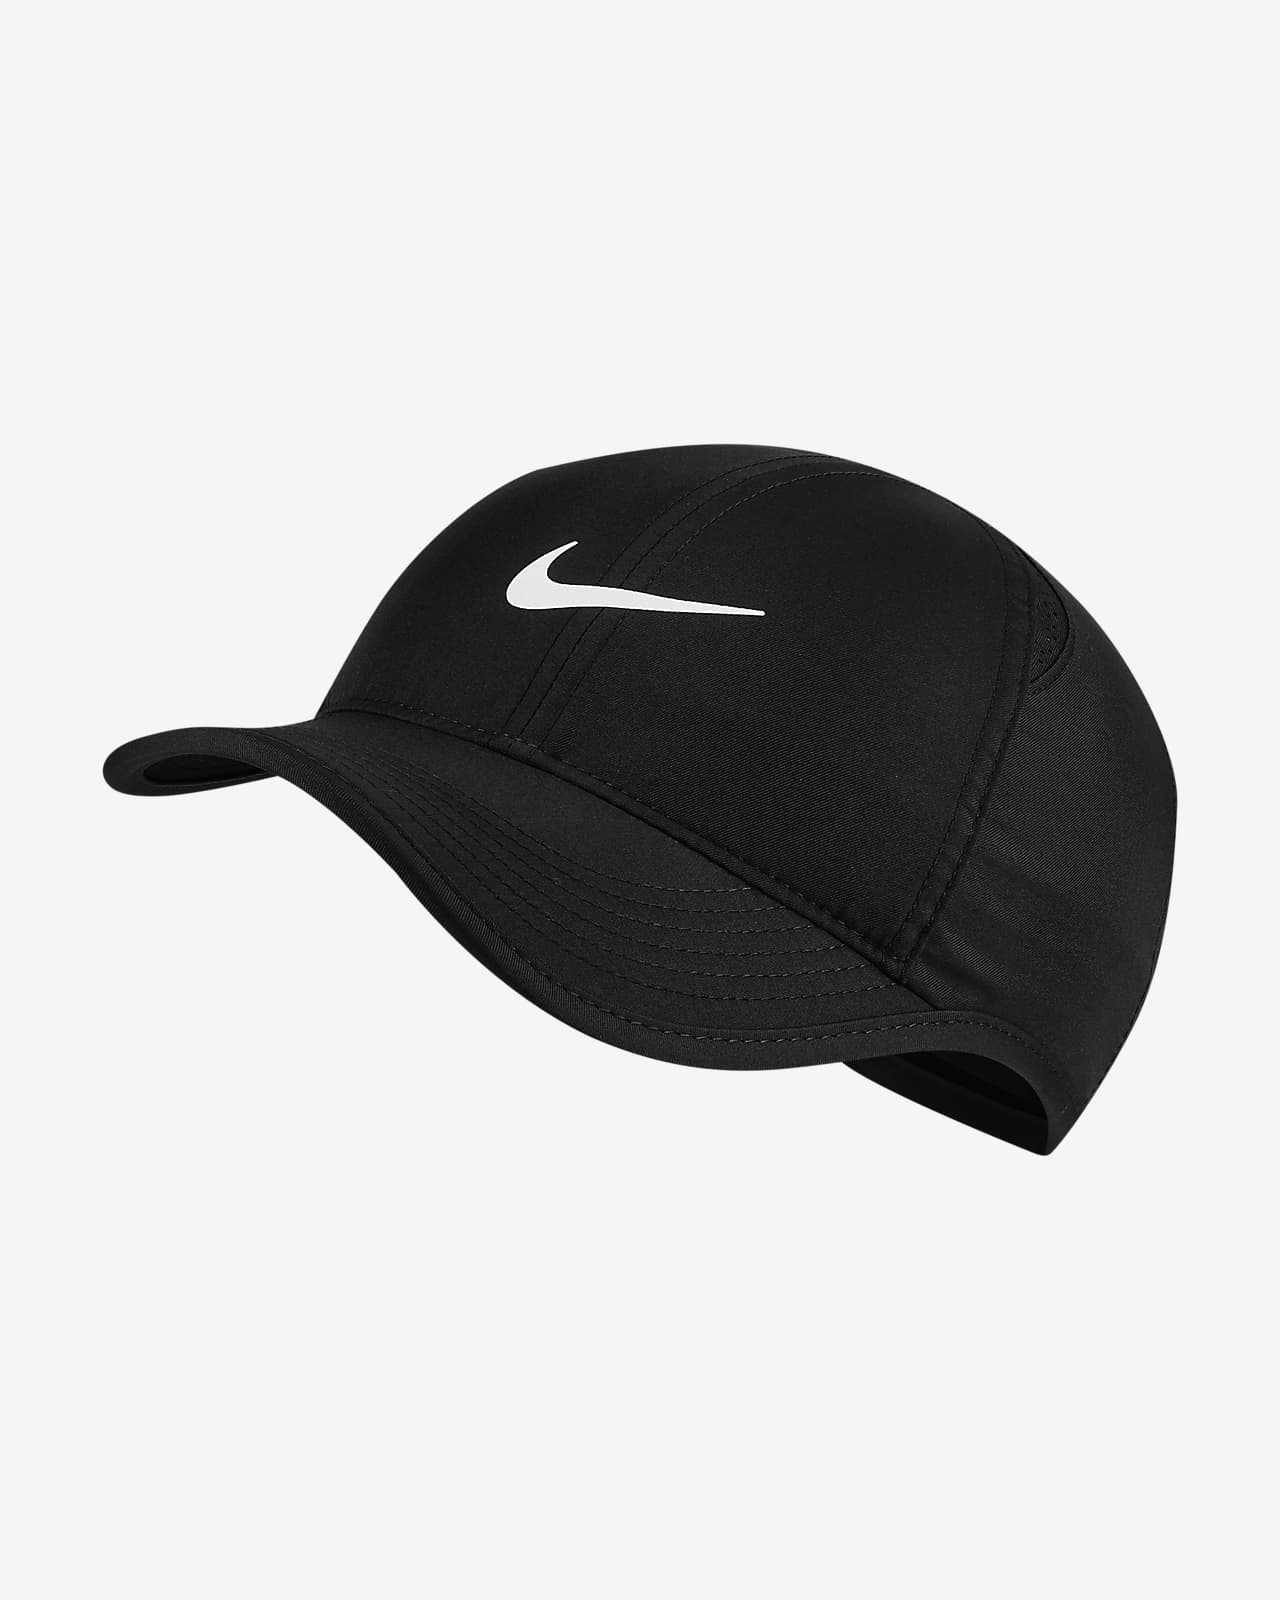 Gorra ajustable para mujer Nike Sportswear AeroBill Featherlight